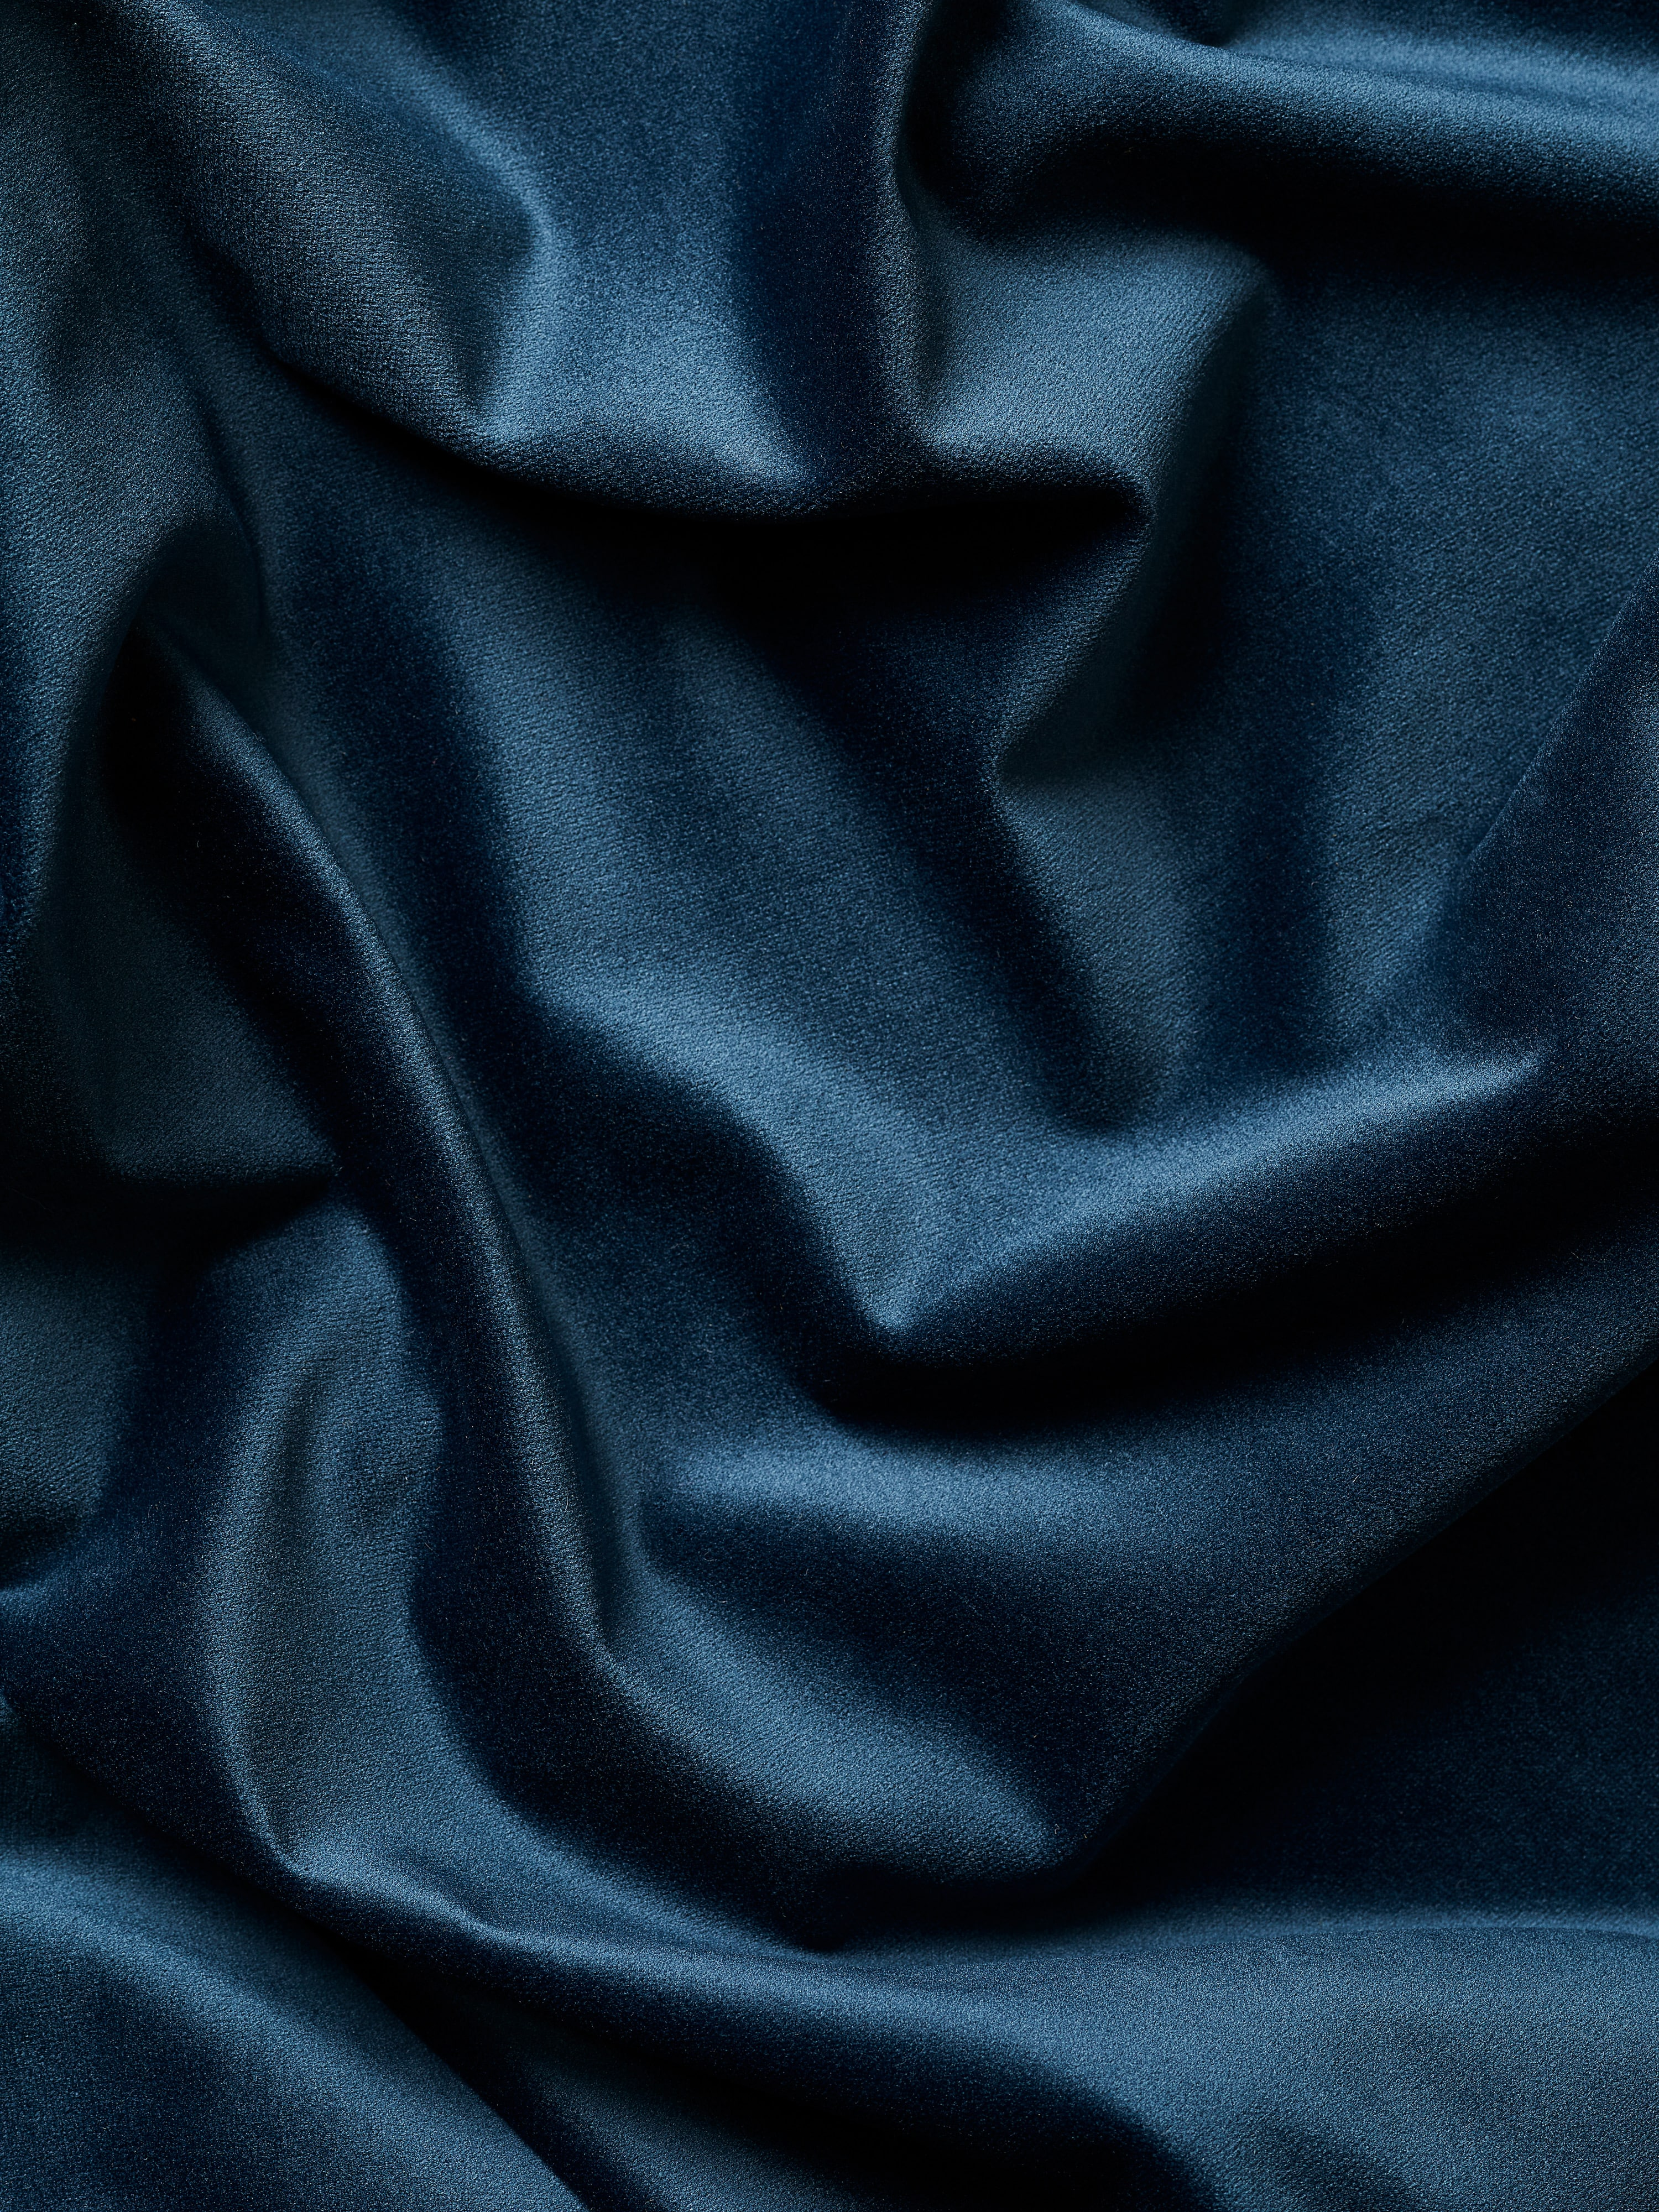 Heaven's Gate Fabric